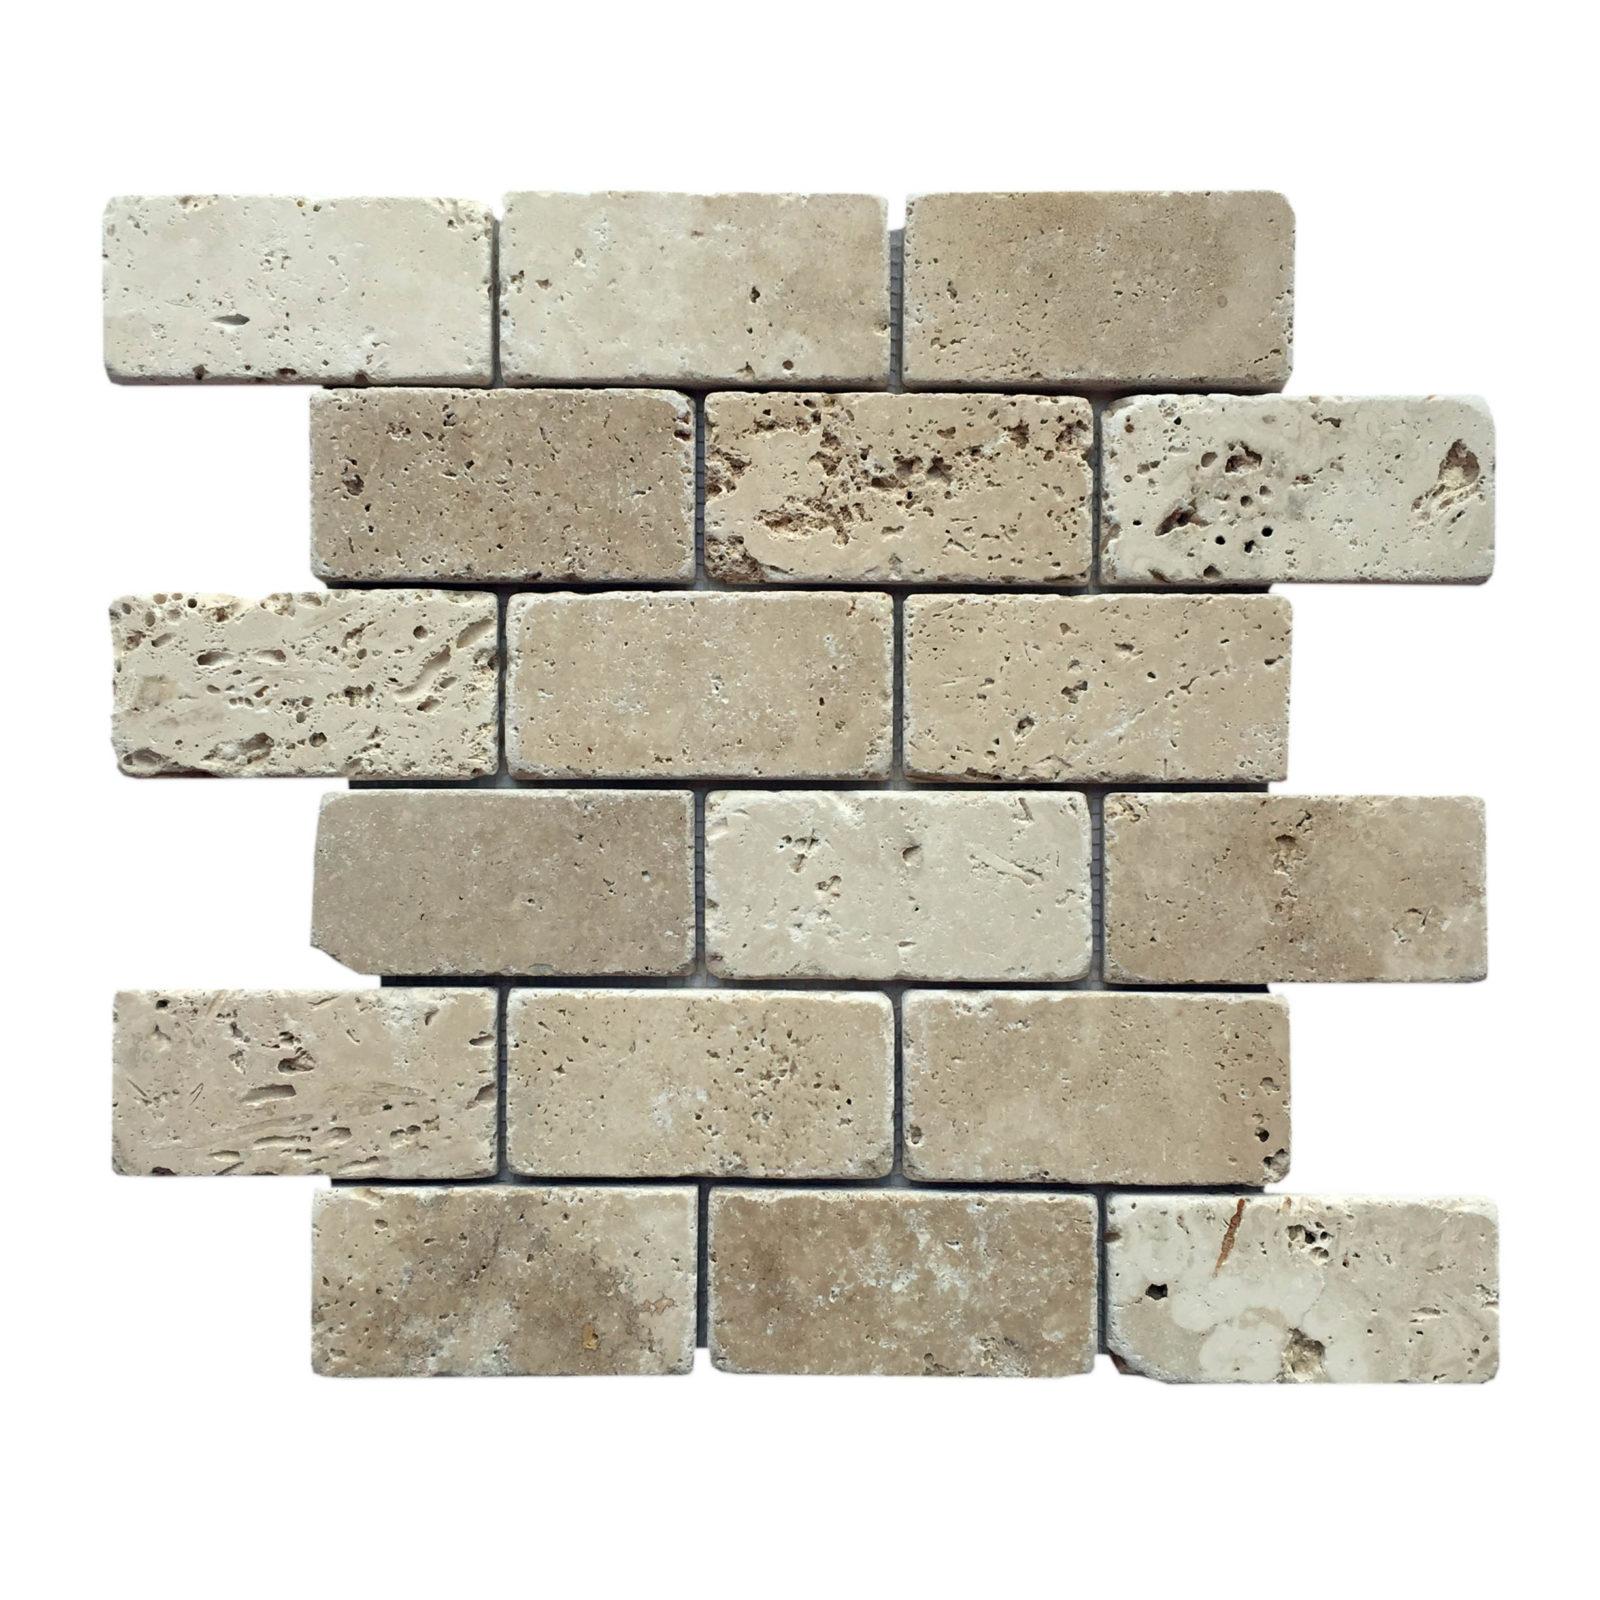 anatolia tile brick mosaic white travertine 2 x 4